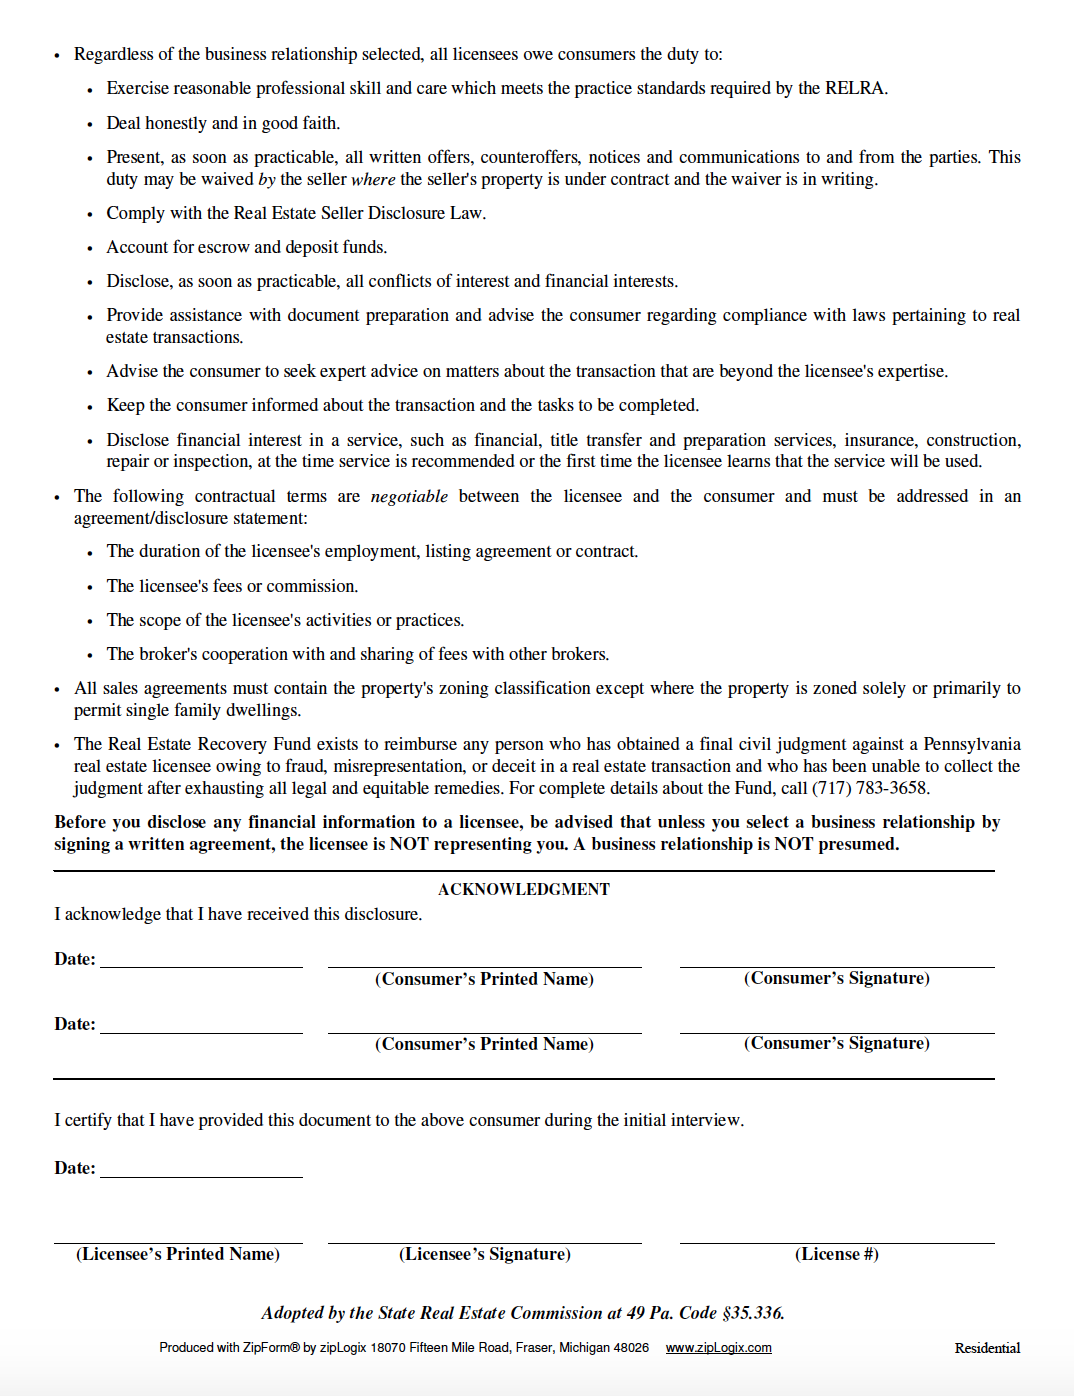 consumer notice, lake wallenpaupack real estate agent